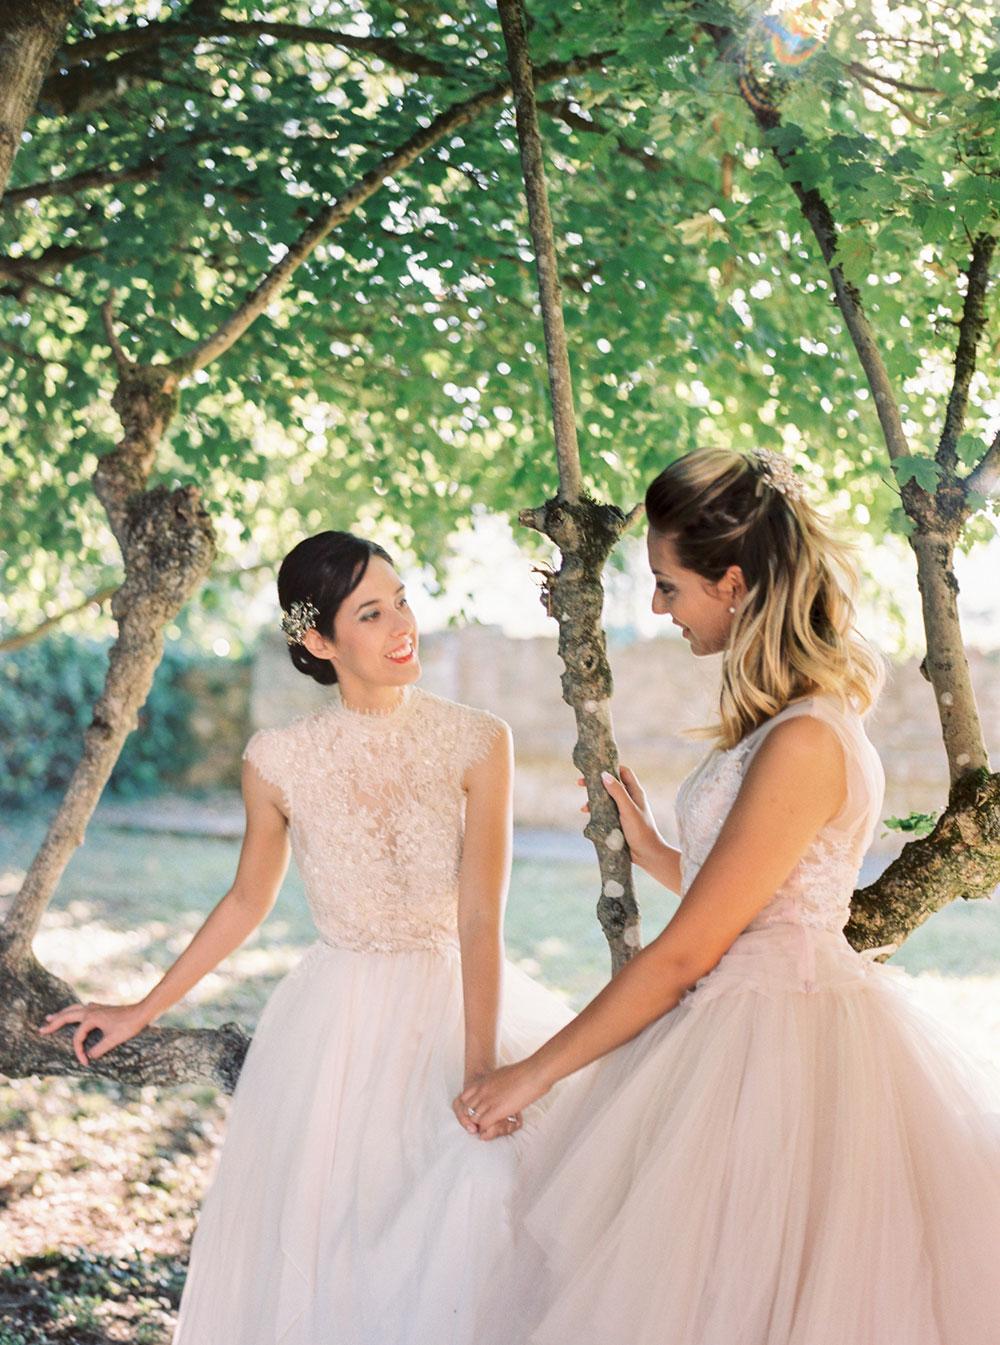 Linari-Tuscany-Elopement-Courtney-Michaela-267